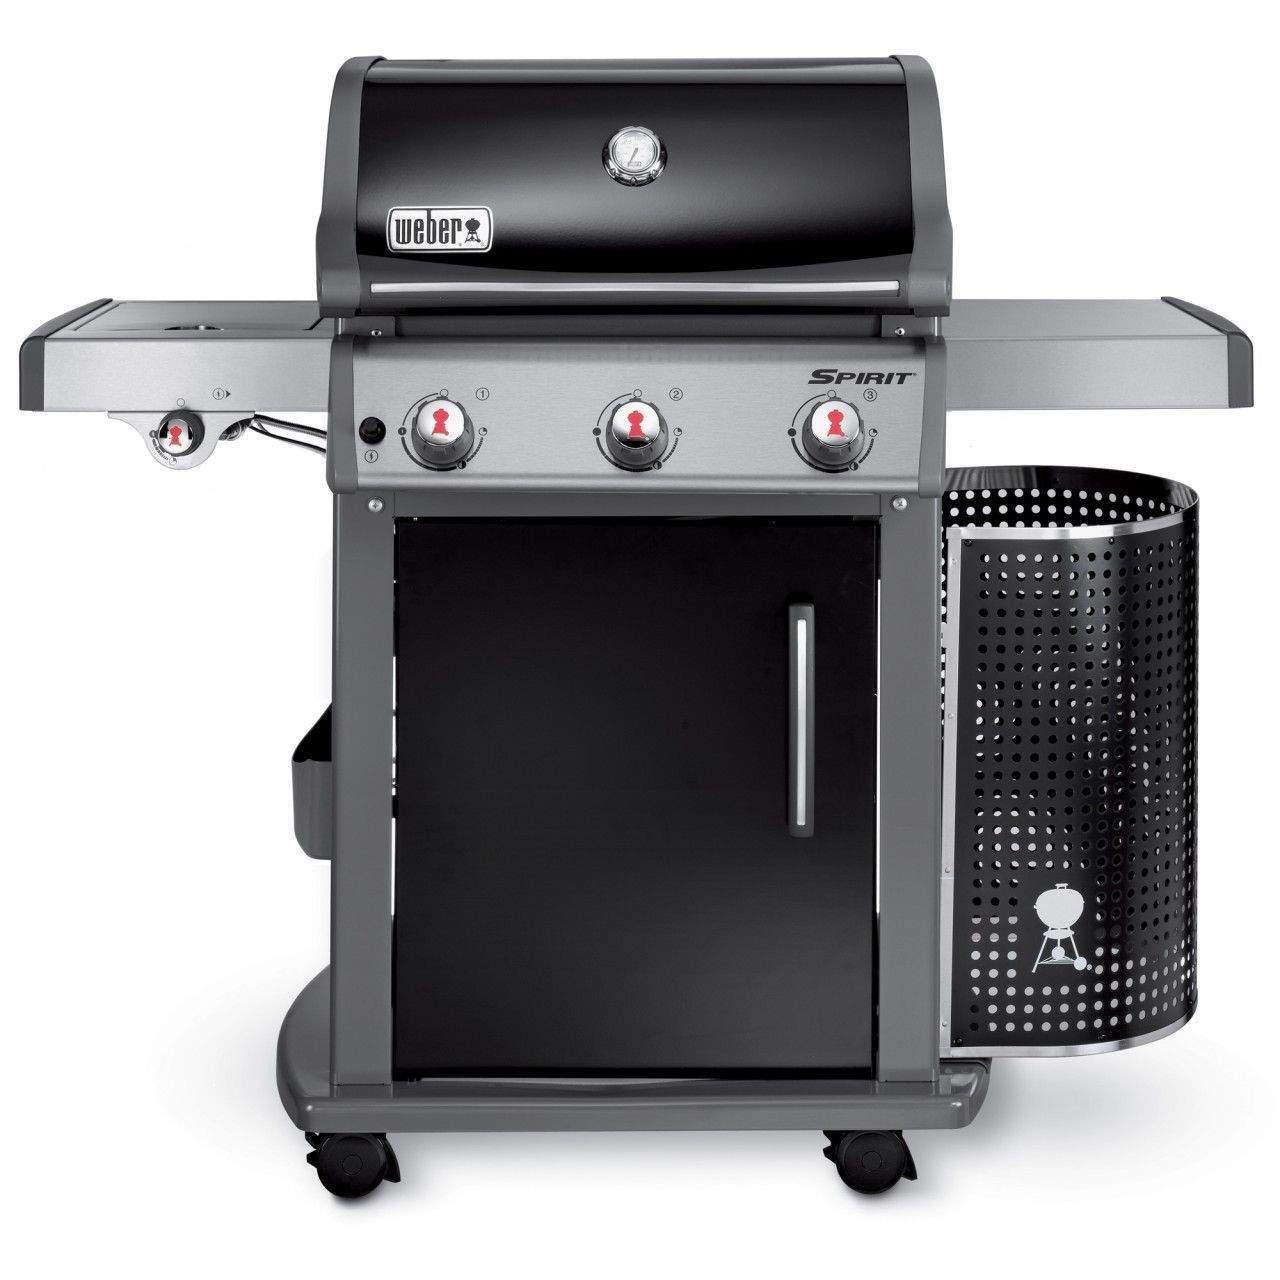 weber spirit premium e 320 gbs barbecuemania. Black Bedroom Furniture Sets. Home Design Ideas